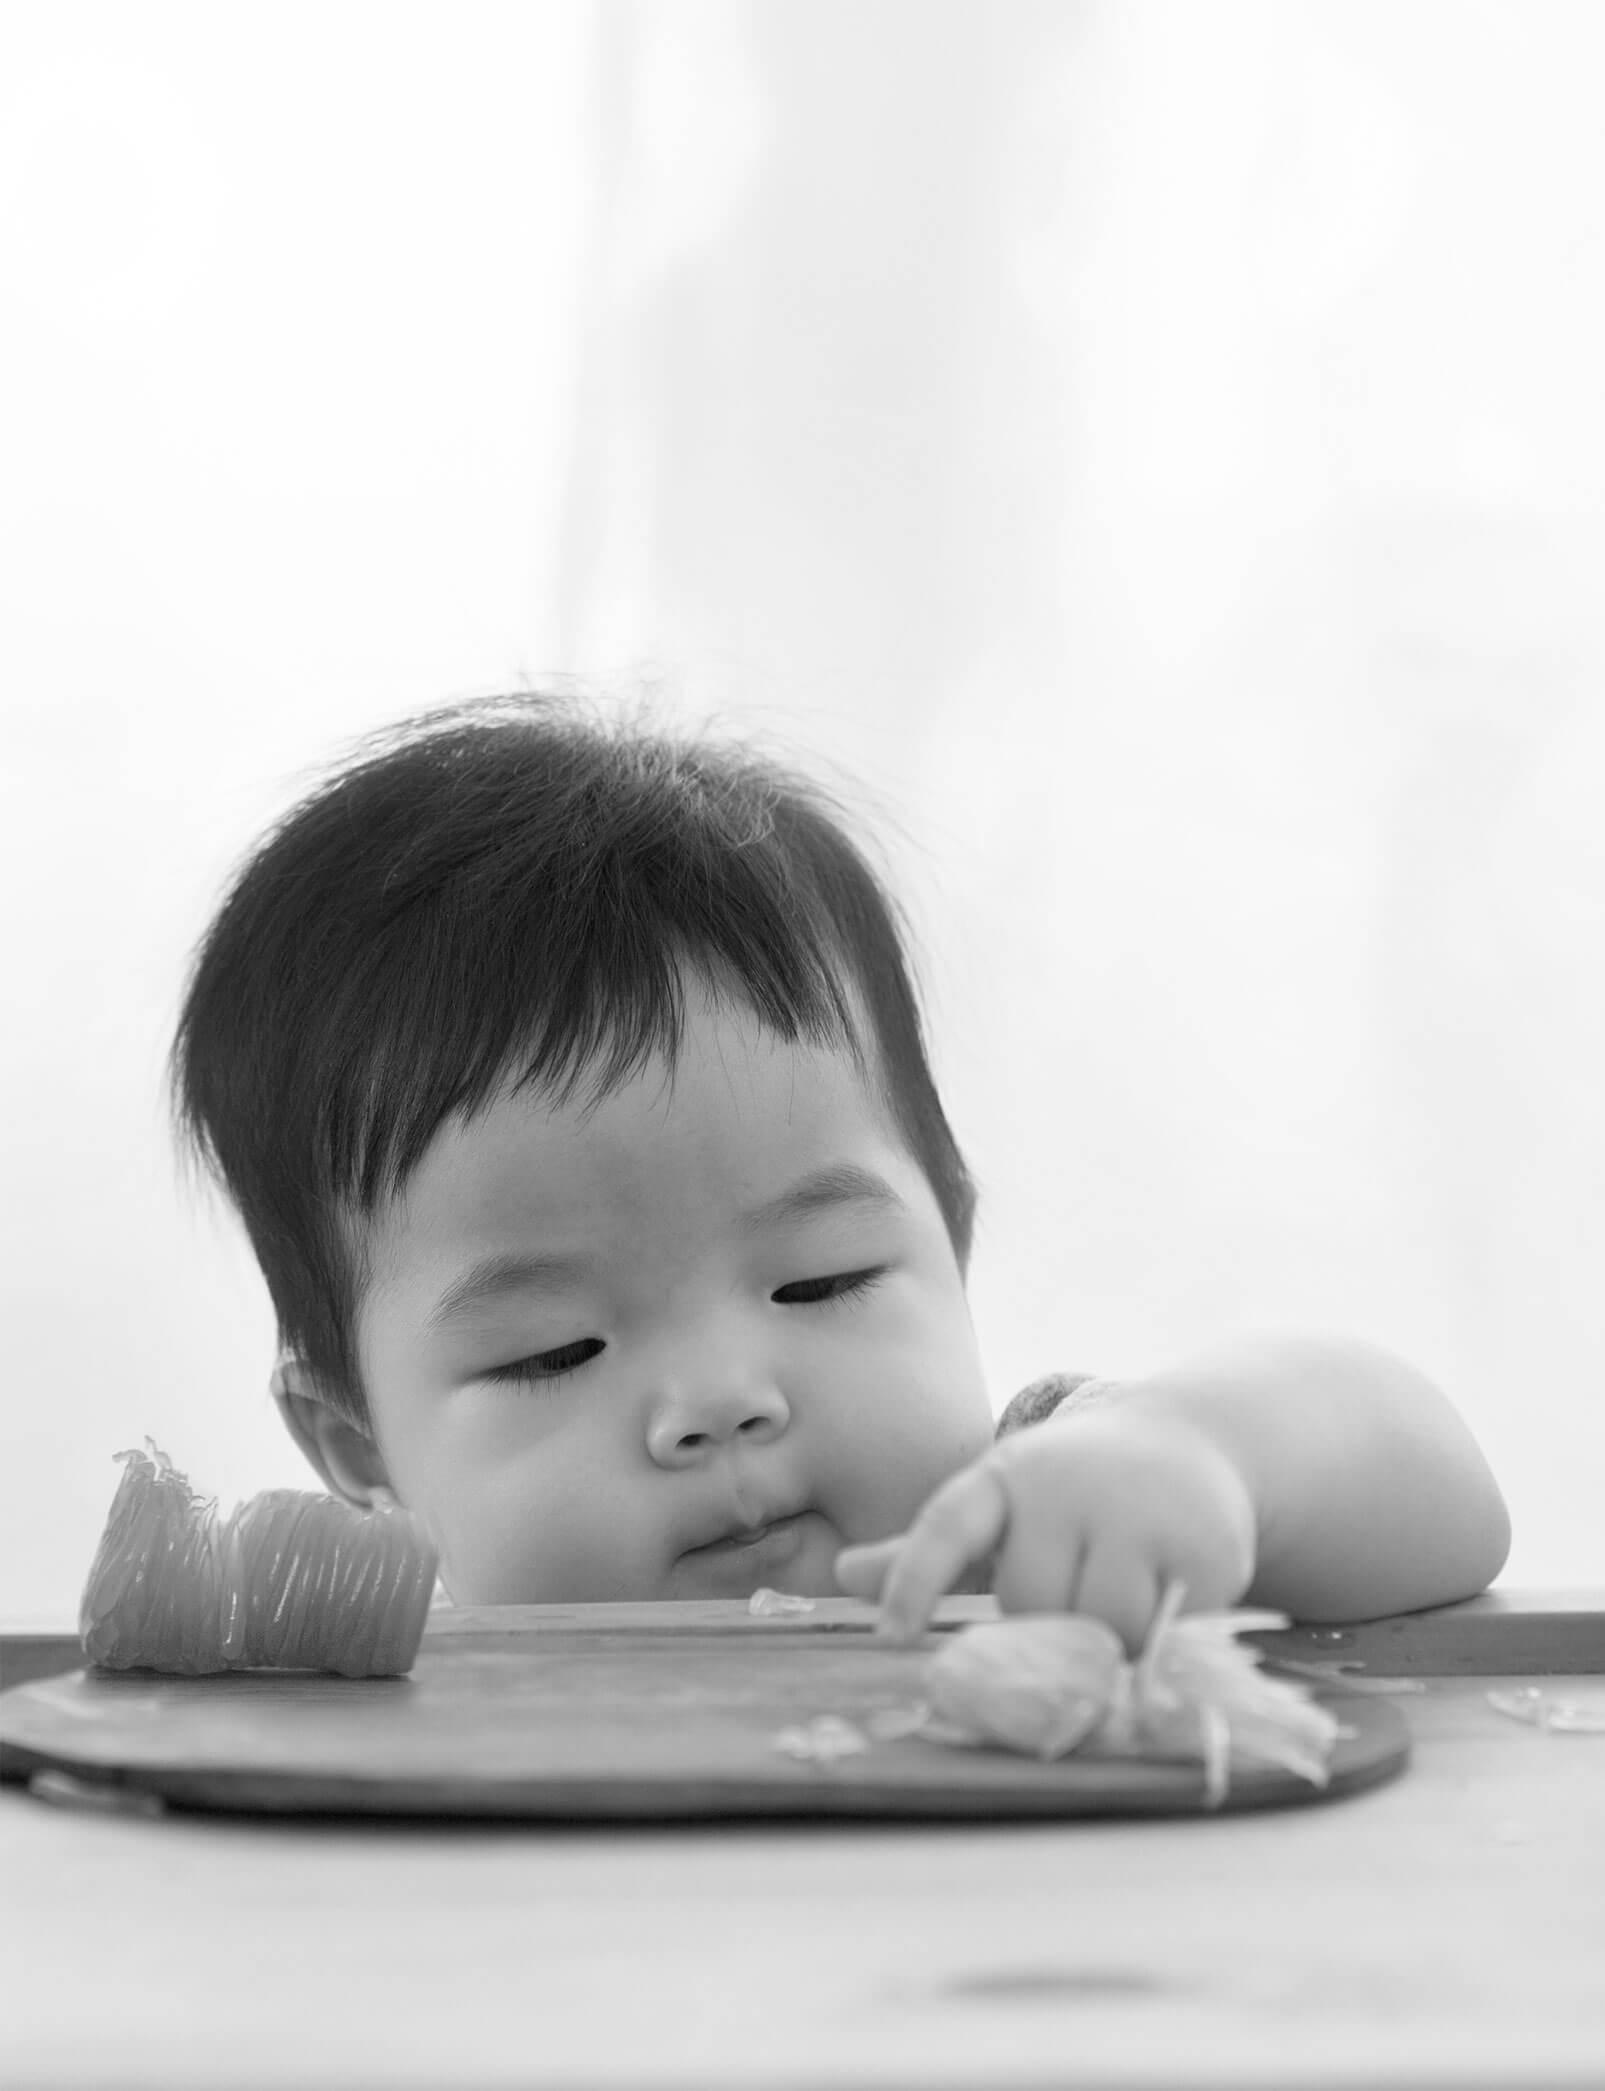 Baby sneaking food